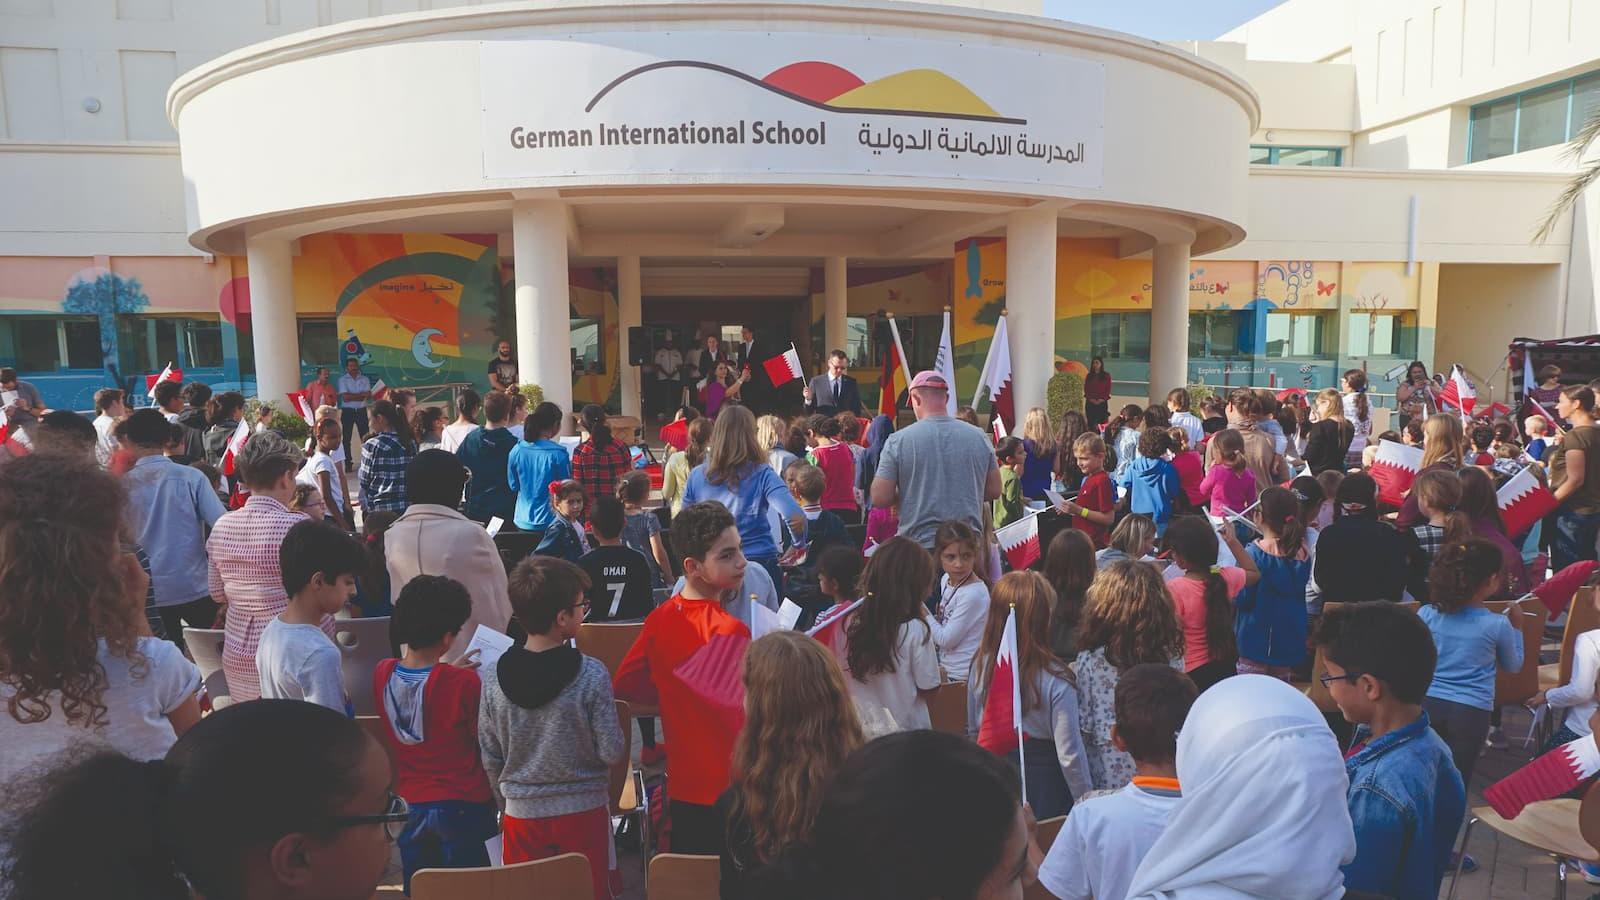 German International School provides holistic, play-based early childhood education